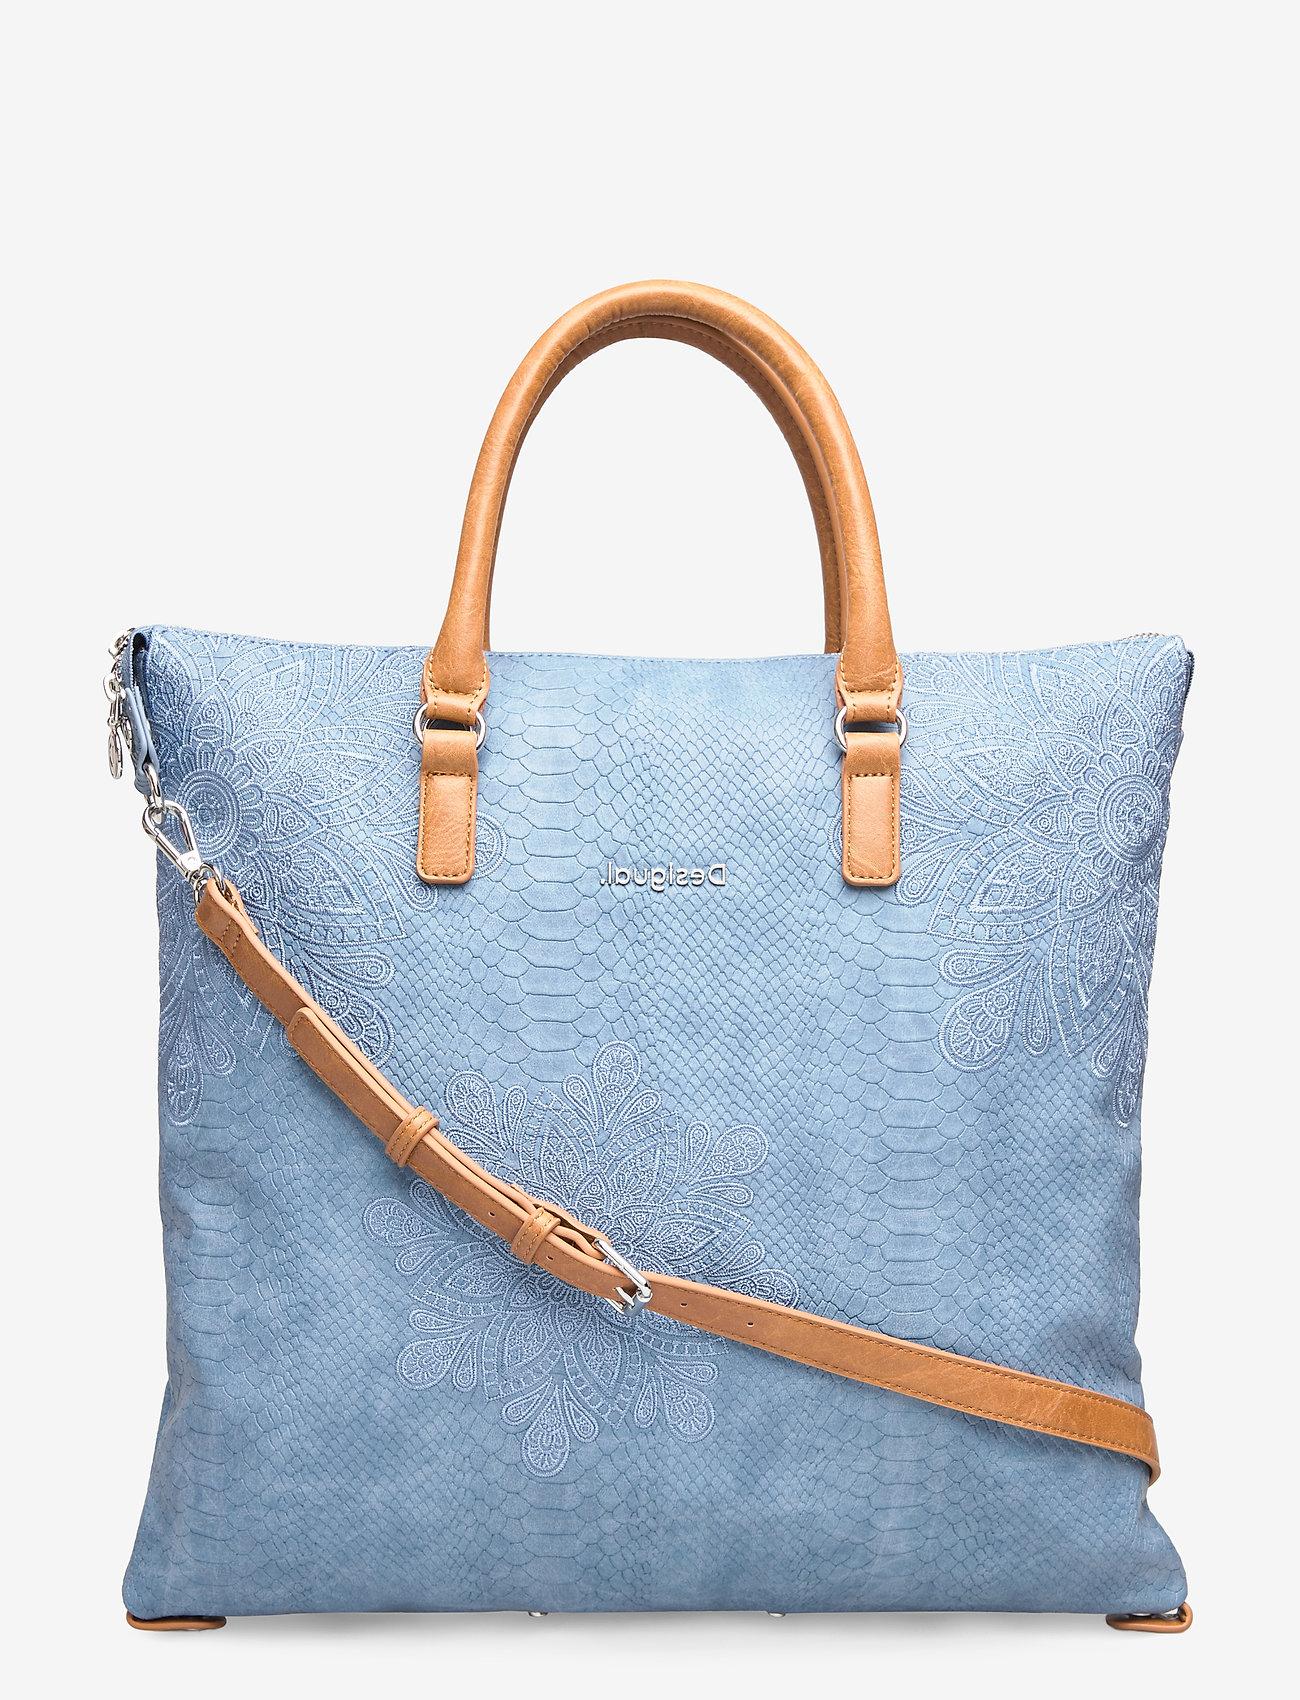 Desigual Accessories - BOLS HELA KONN - sacs à anse - azul media noche